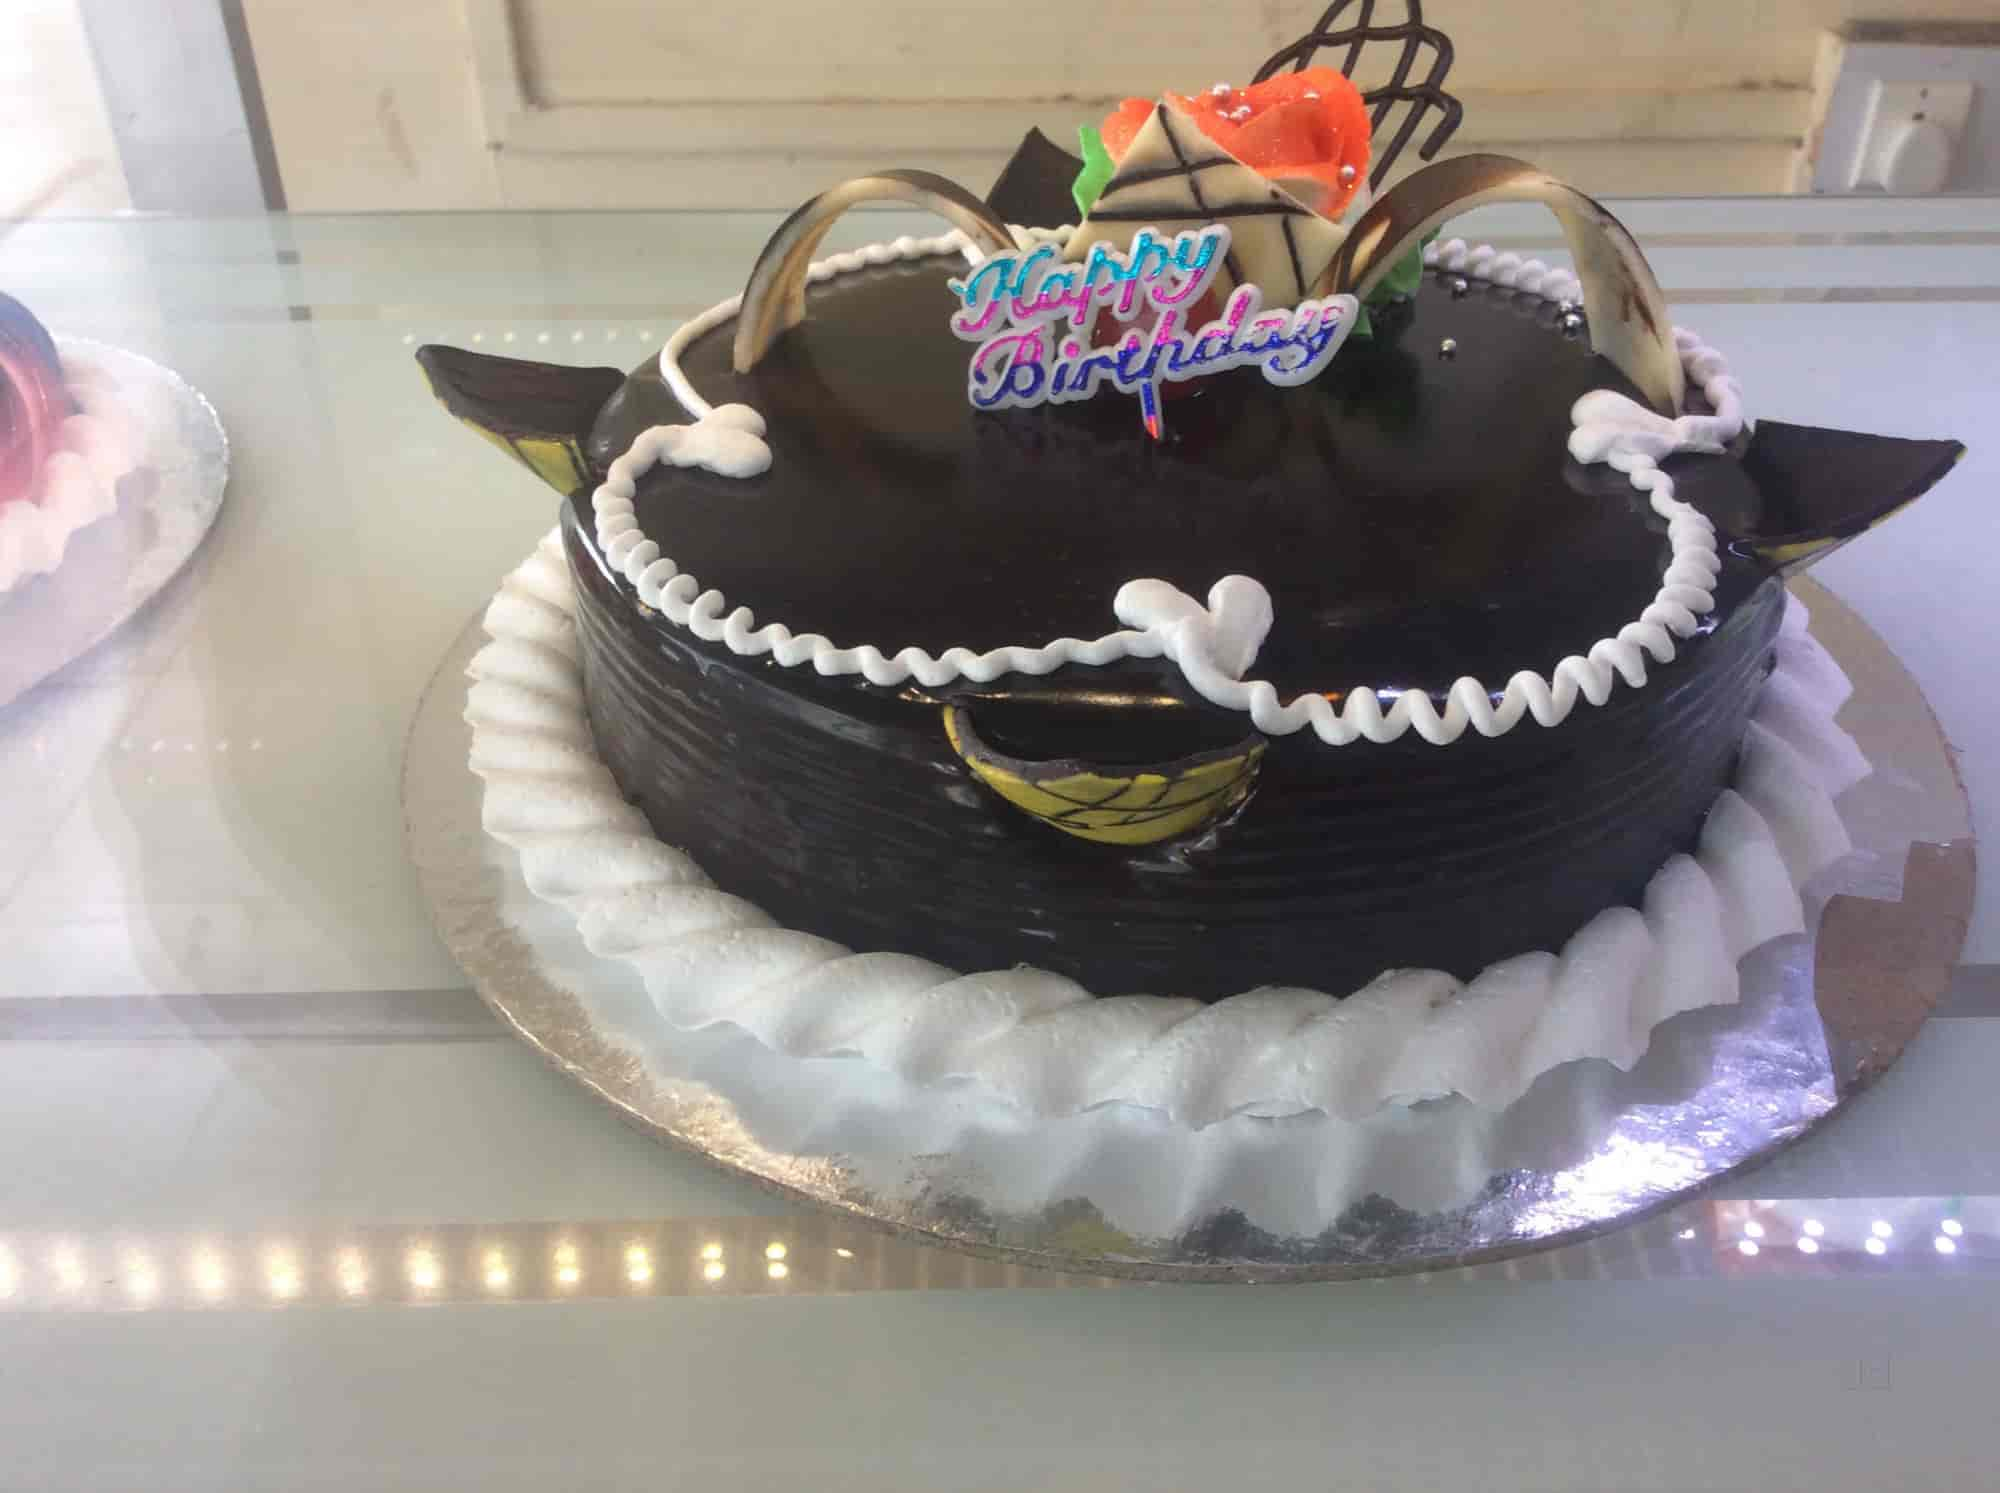 Happy Cakes Bijapur HO Cake Shops in BijapurKarnataka Justdial